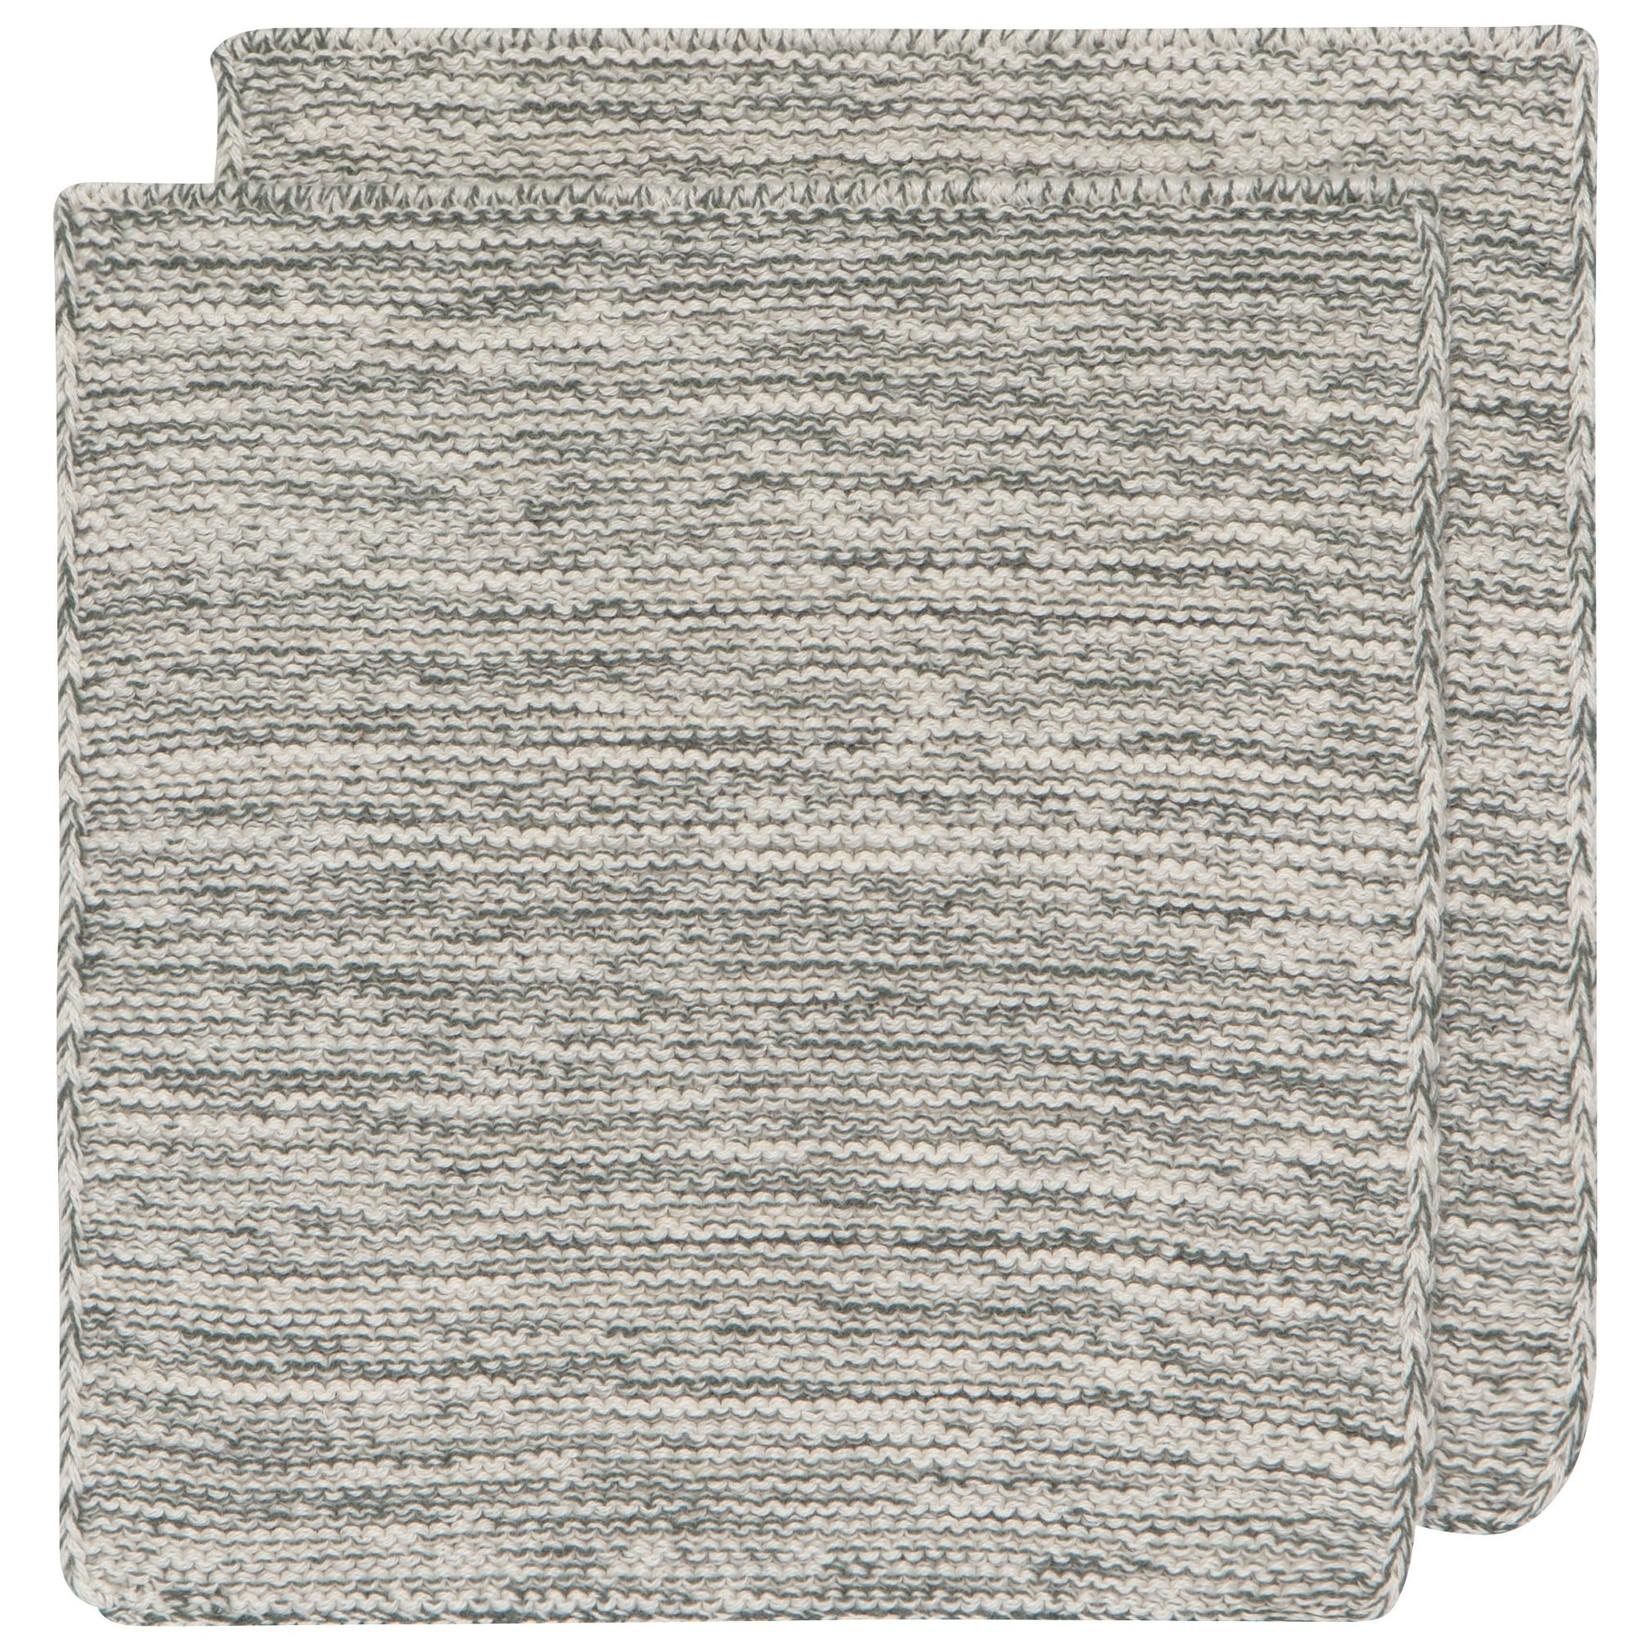 Heirloom Knit Dishcloth Set